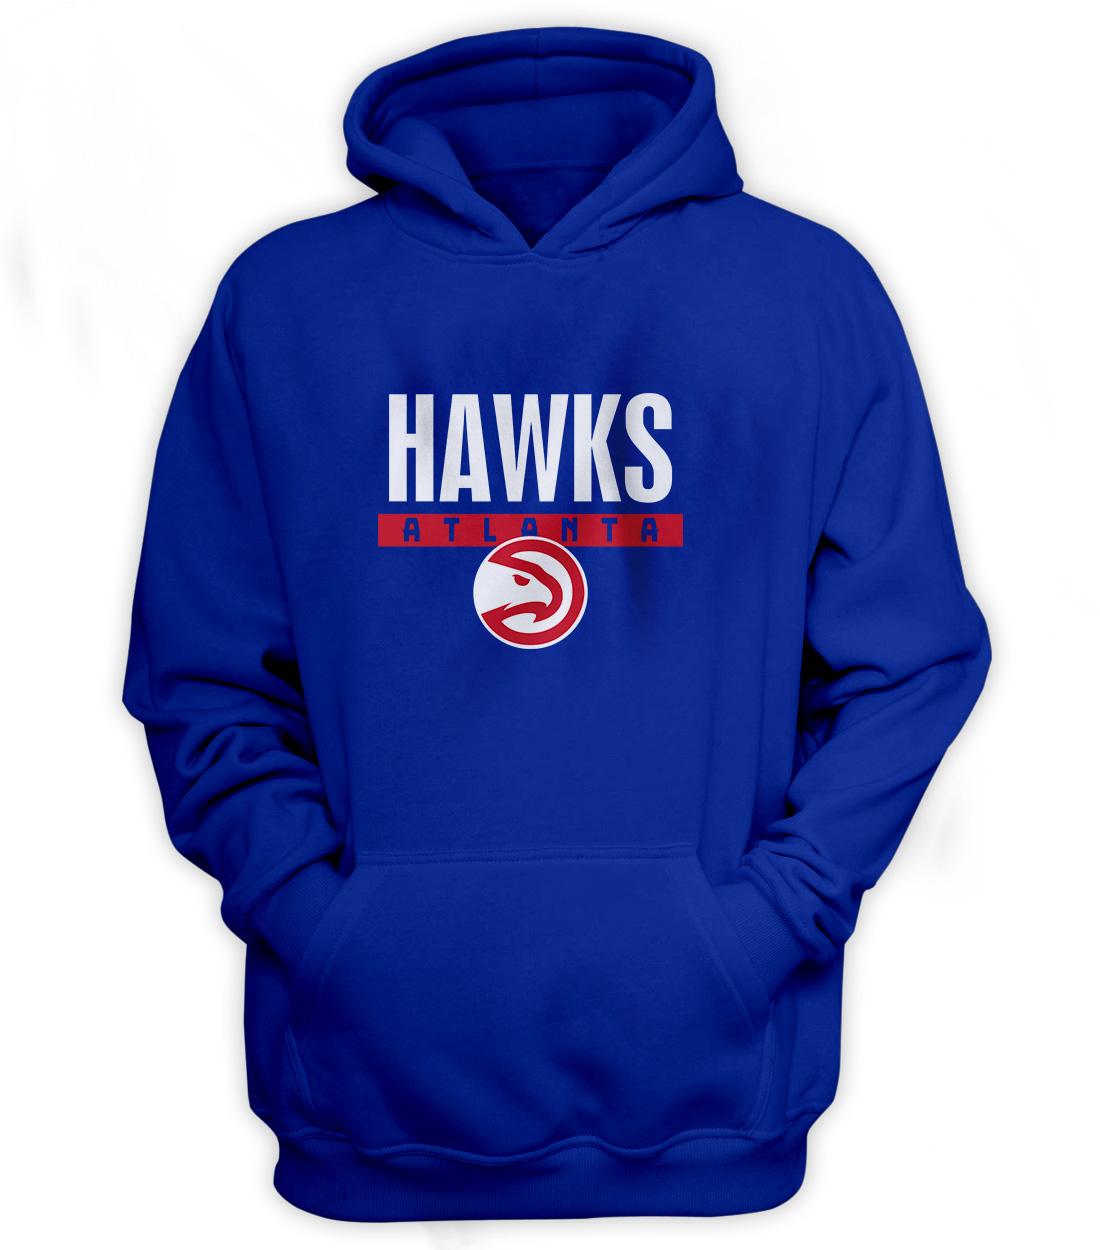 Atlanta Hawks Hoodie (HD-BLU-NP-19-NBA-ATL-HAWKS)